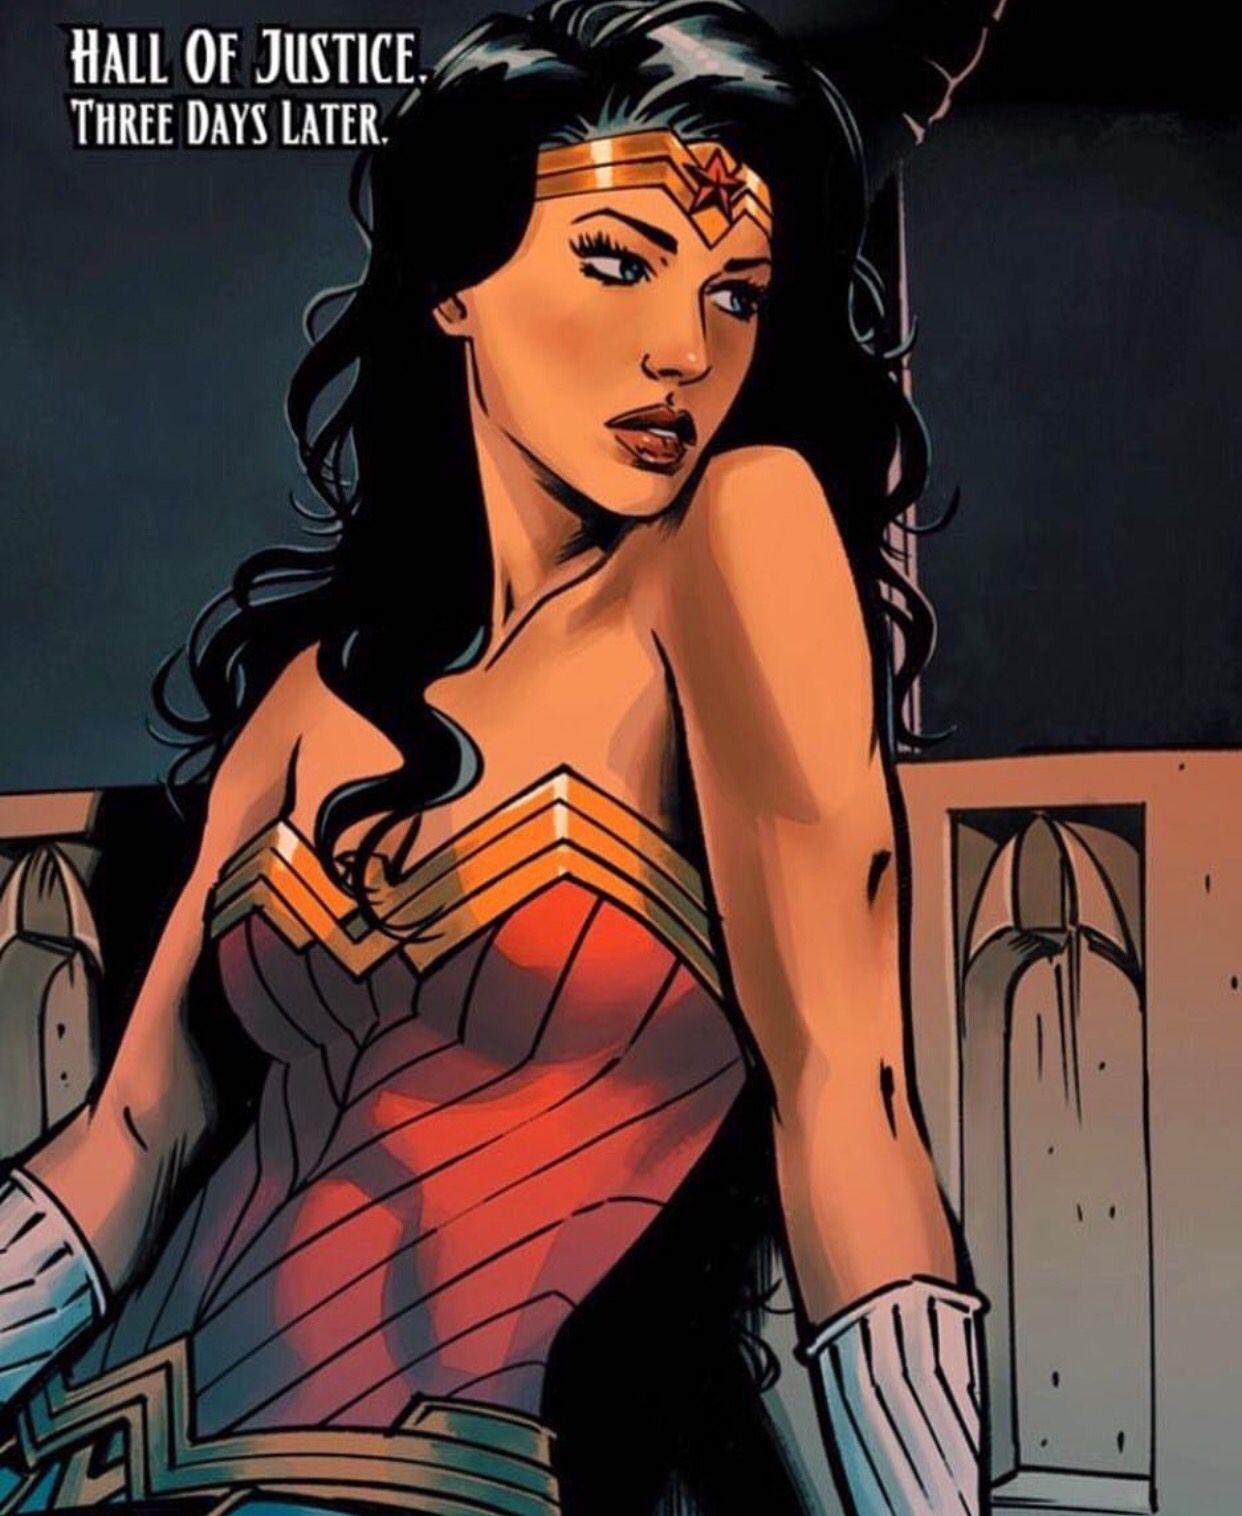 Pin By Rick Grimes On Wonderbat Wonder Woman Comic Wonder Woman Art Wonder Woman Pictures